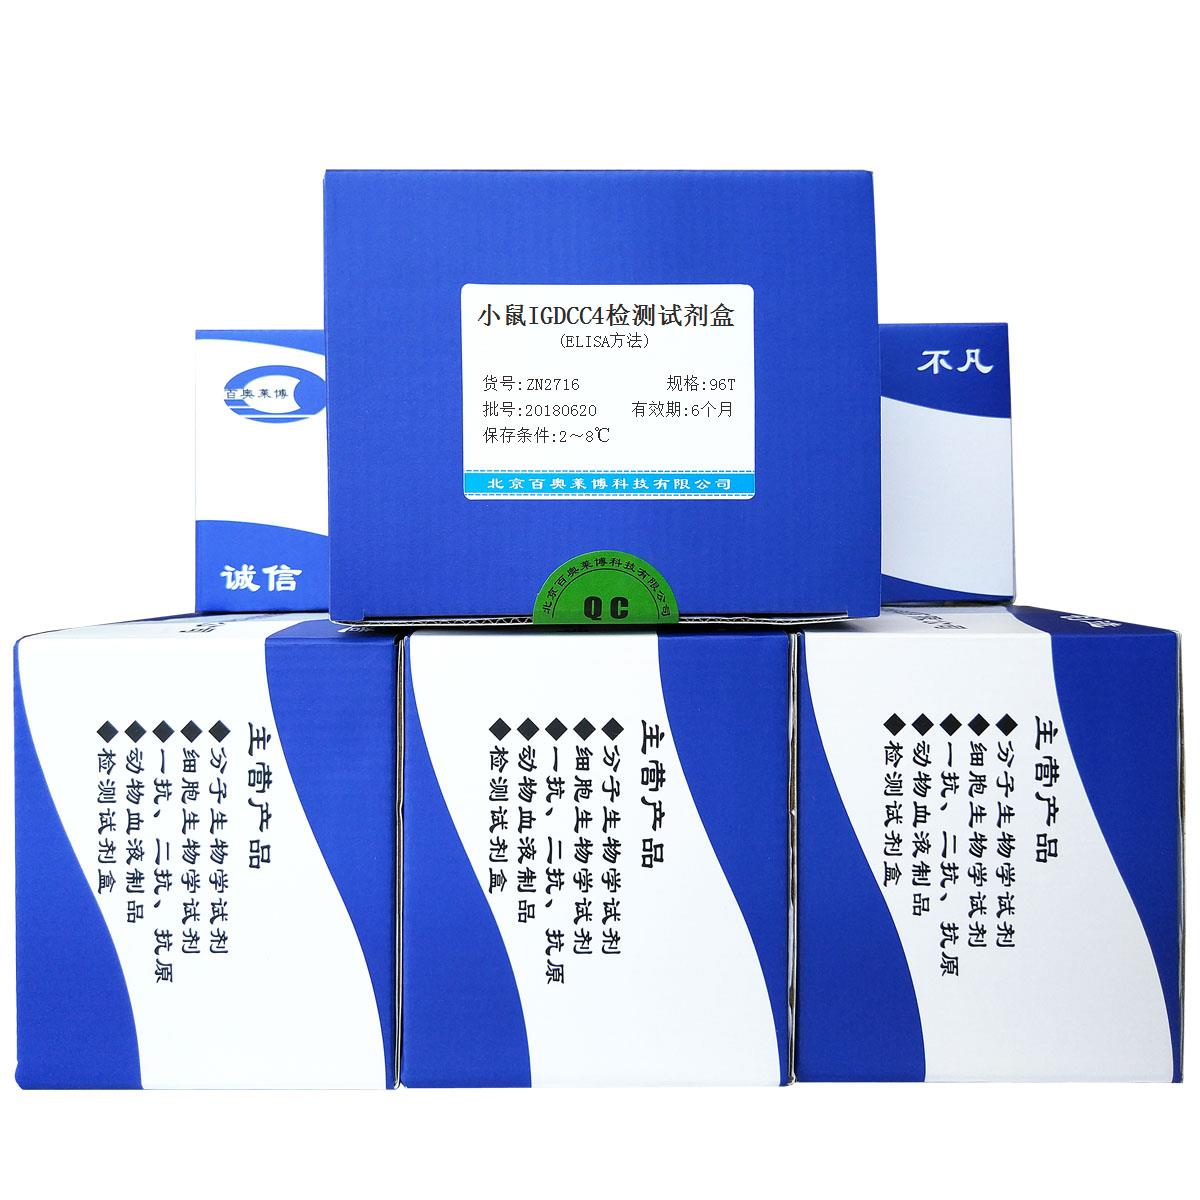 小鼠IGDCC4检测试剂盒(ELISA方法) 小鼠ELISA试剂盒